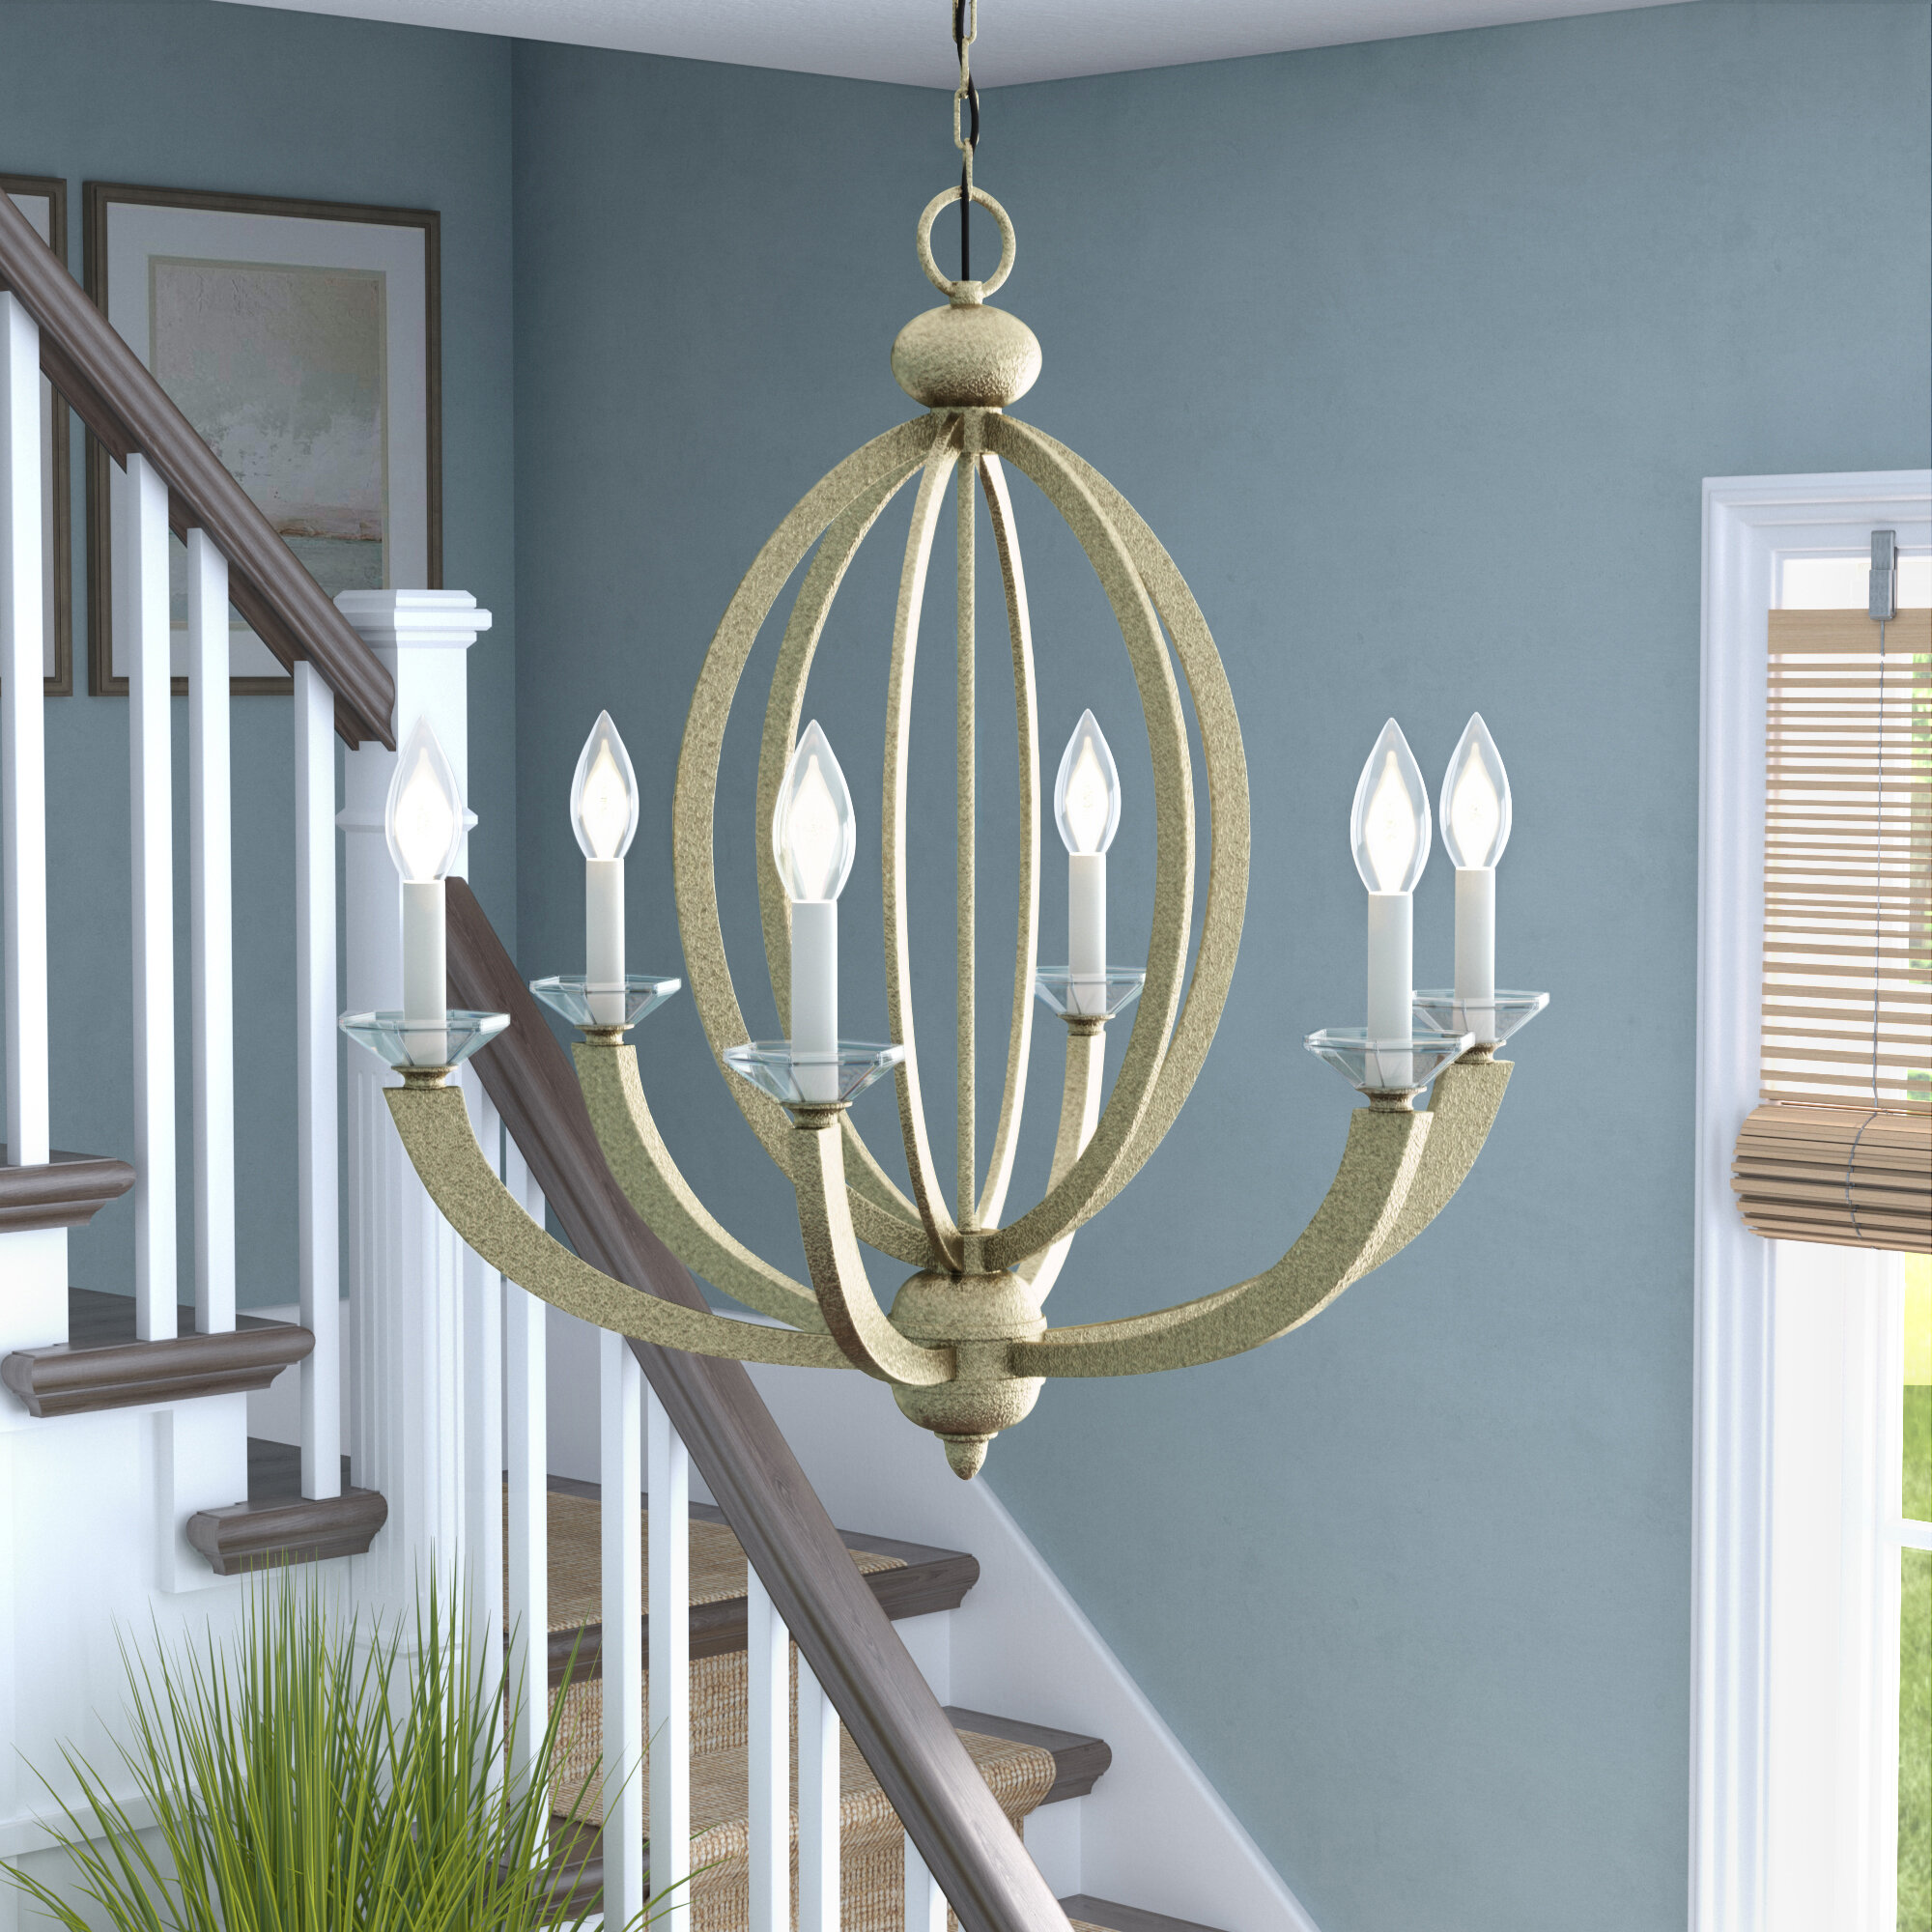 Beachcrest Home Bemot 6-Light Candle-Style Chandelier & Reviews ...